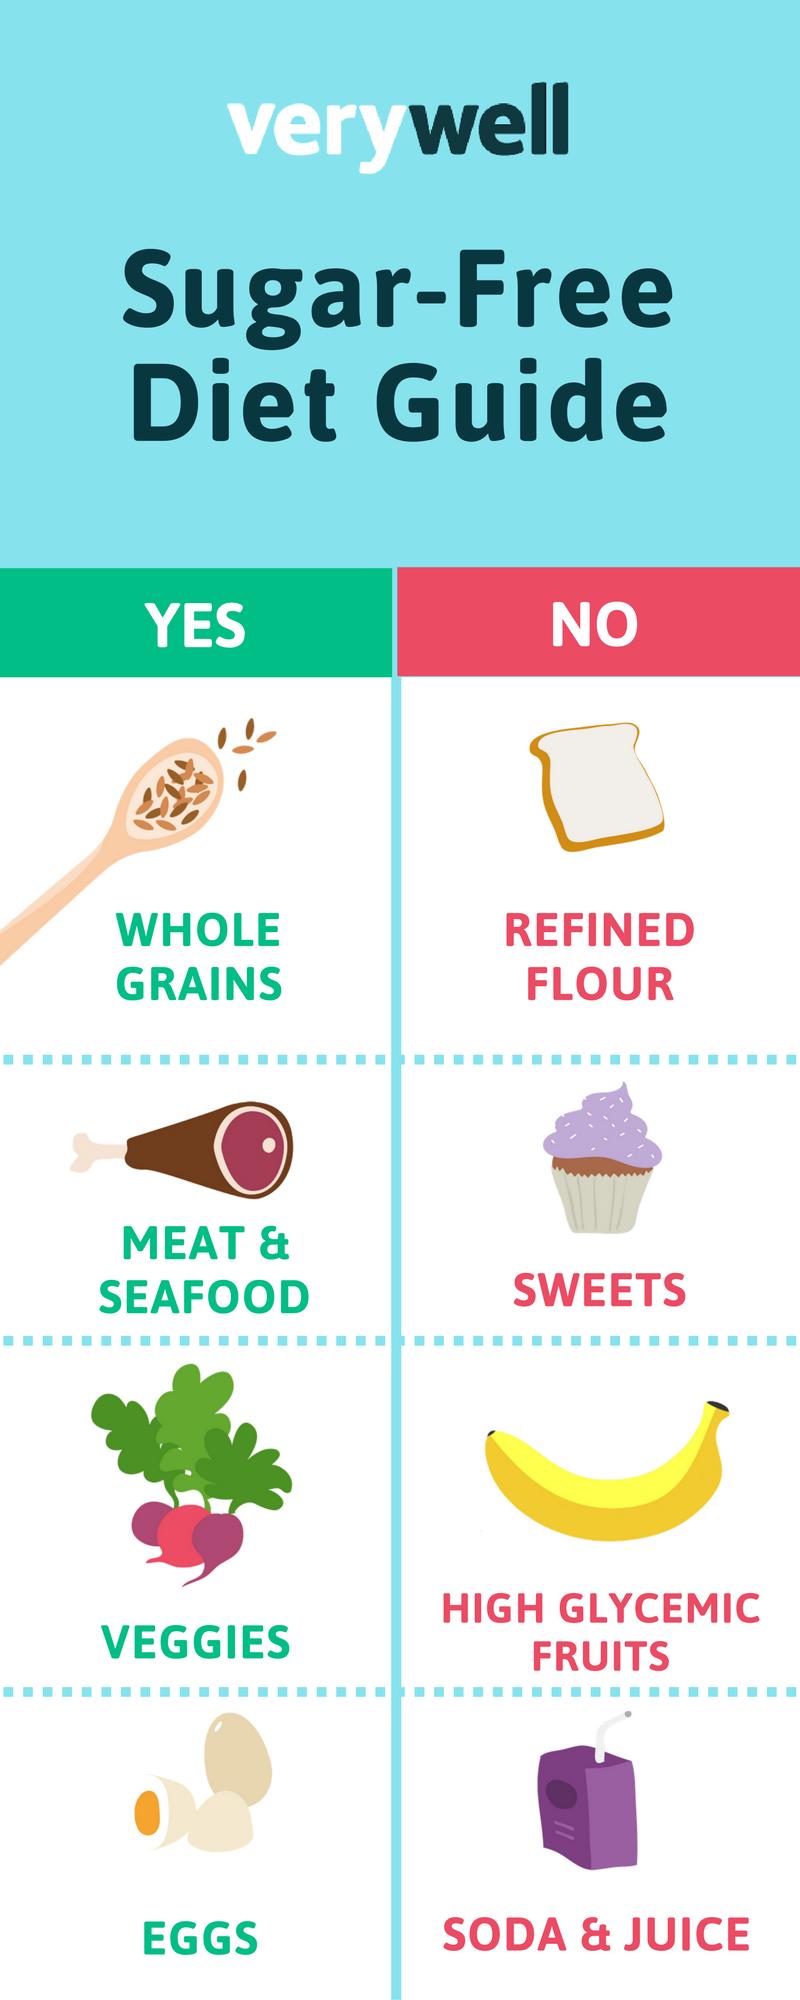 temoving sugar frim your diet